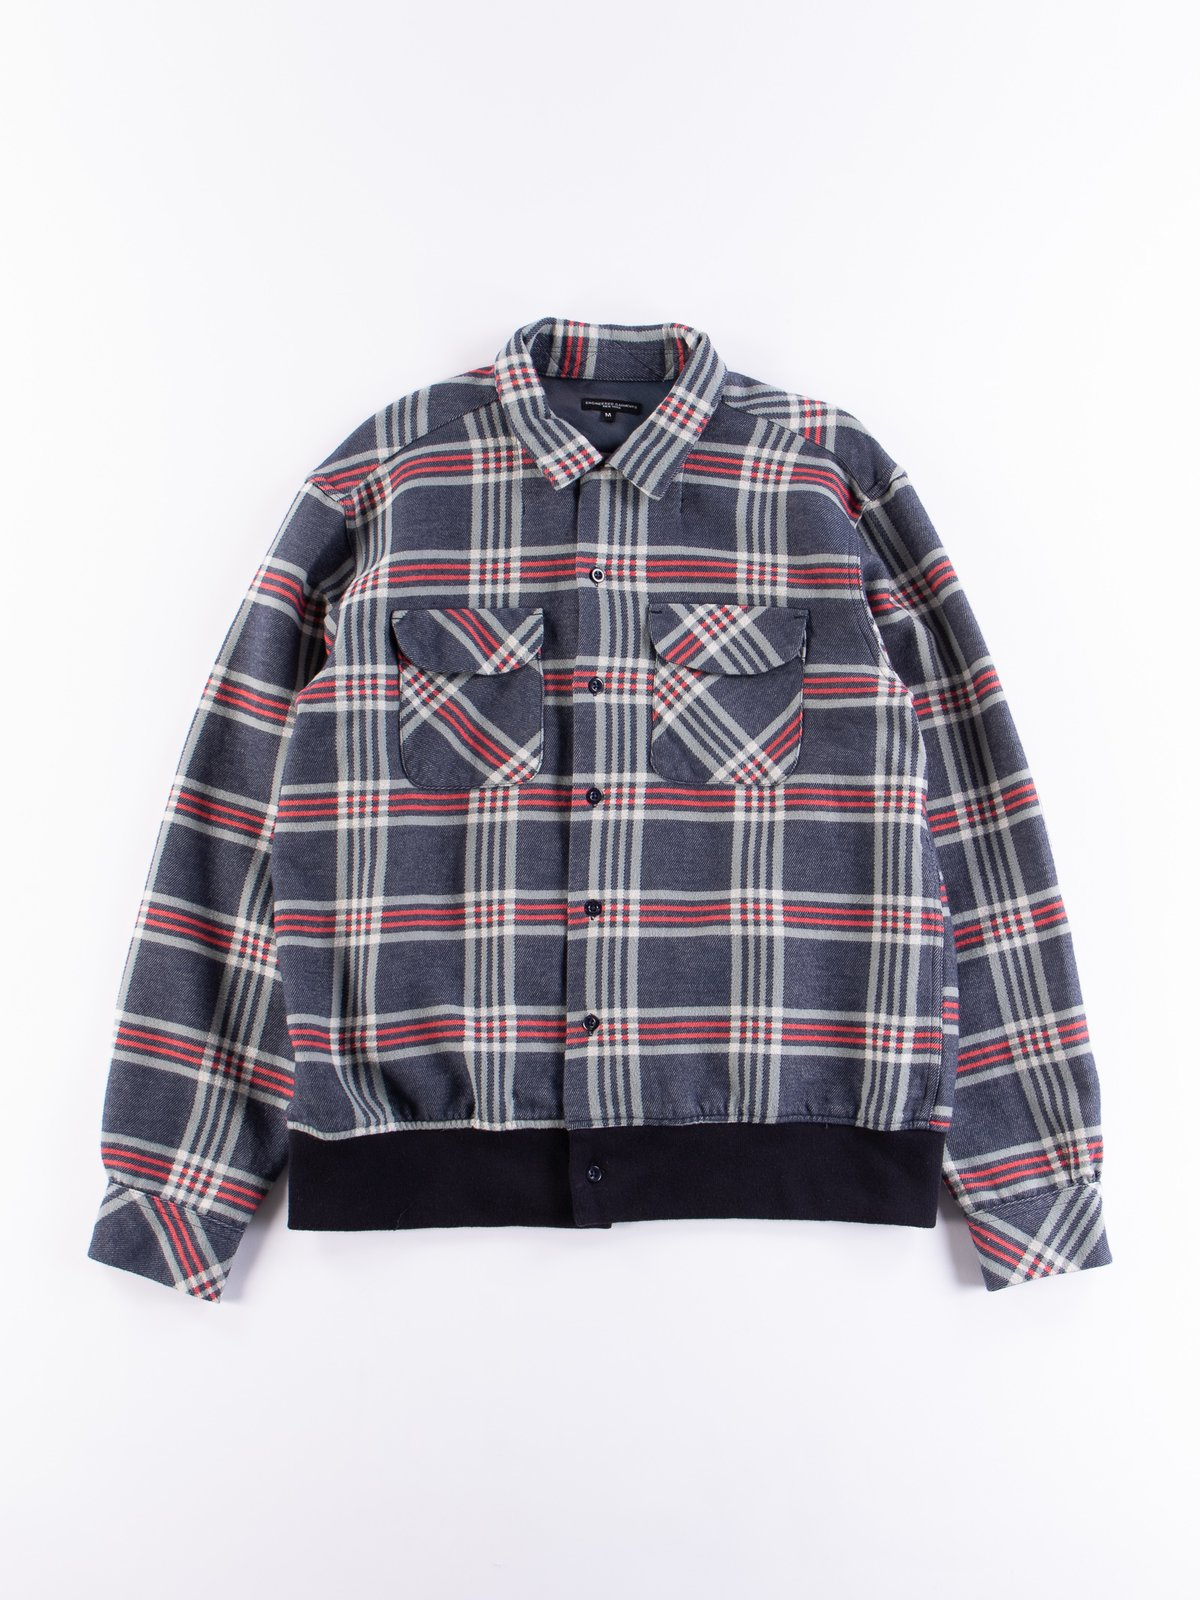 Navy/Teal/Red Big Plaid Classic Shirt - Image 1